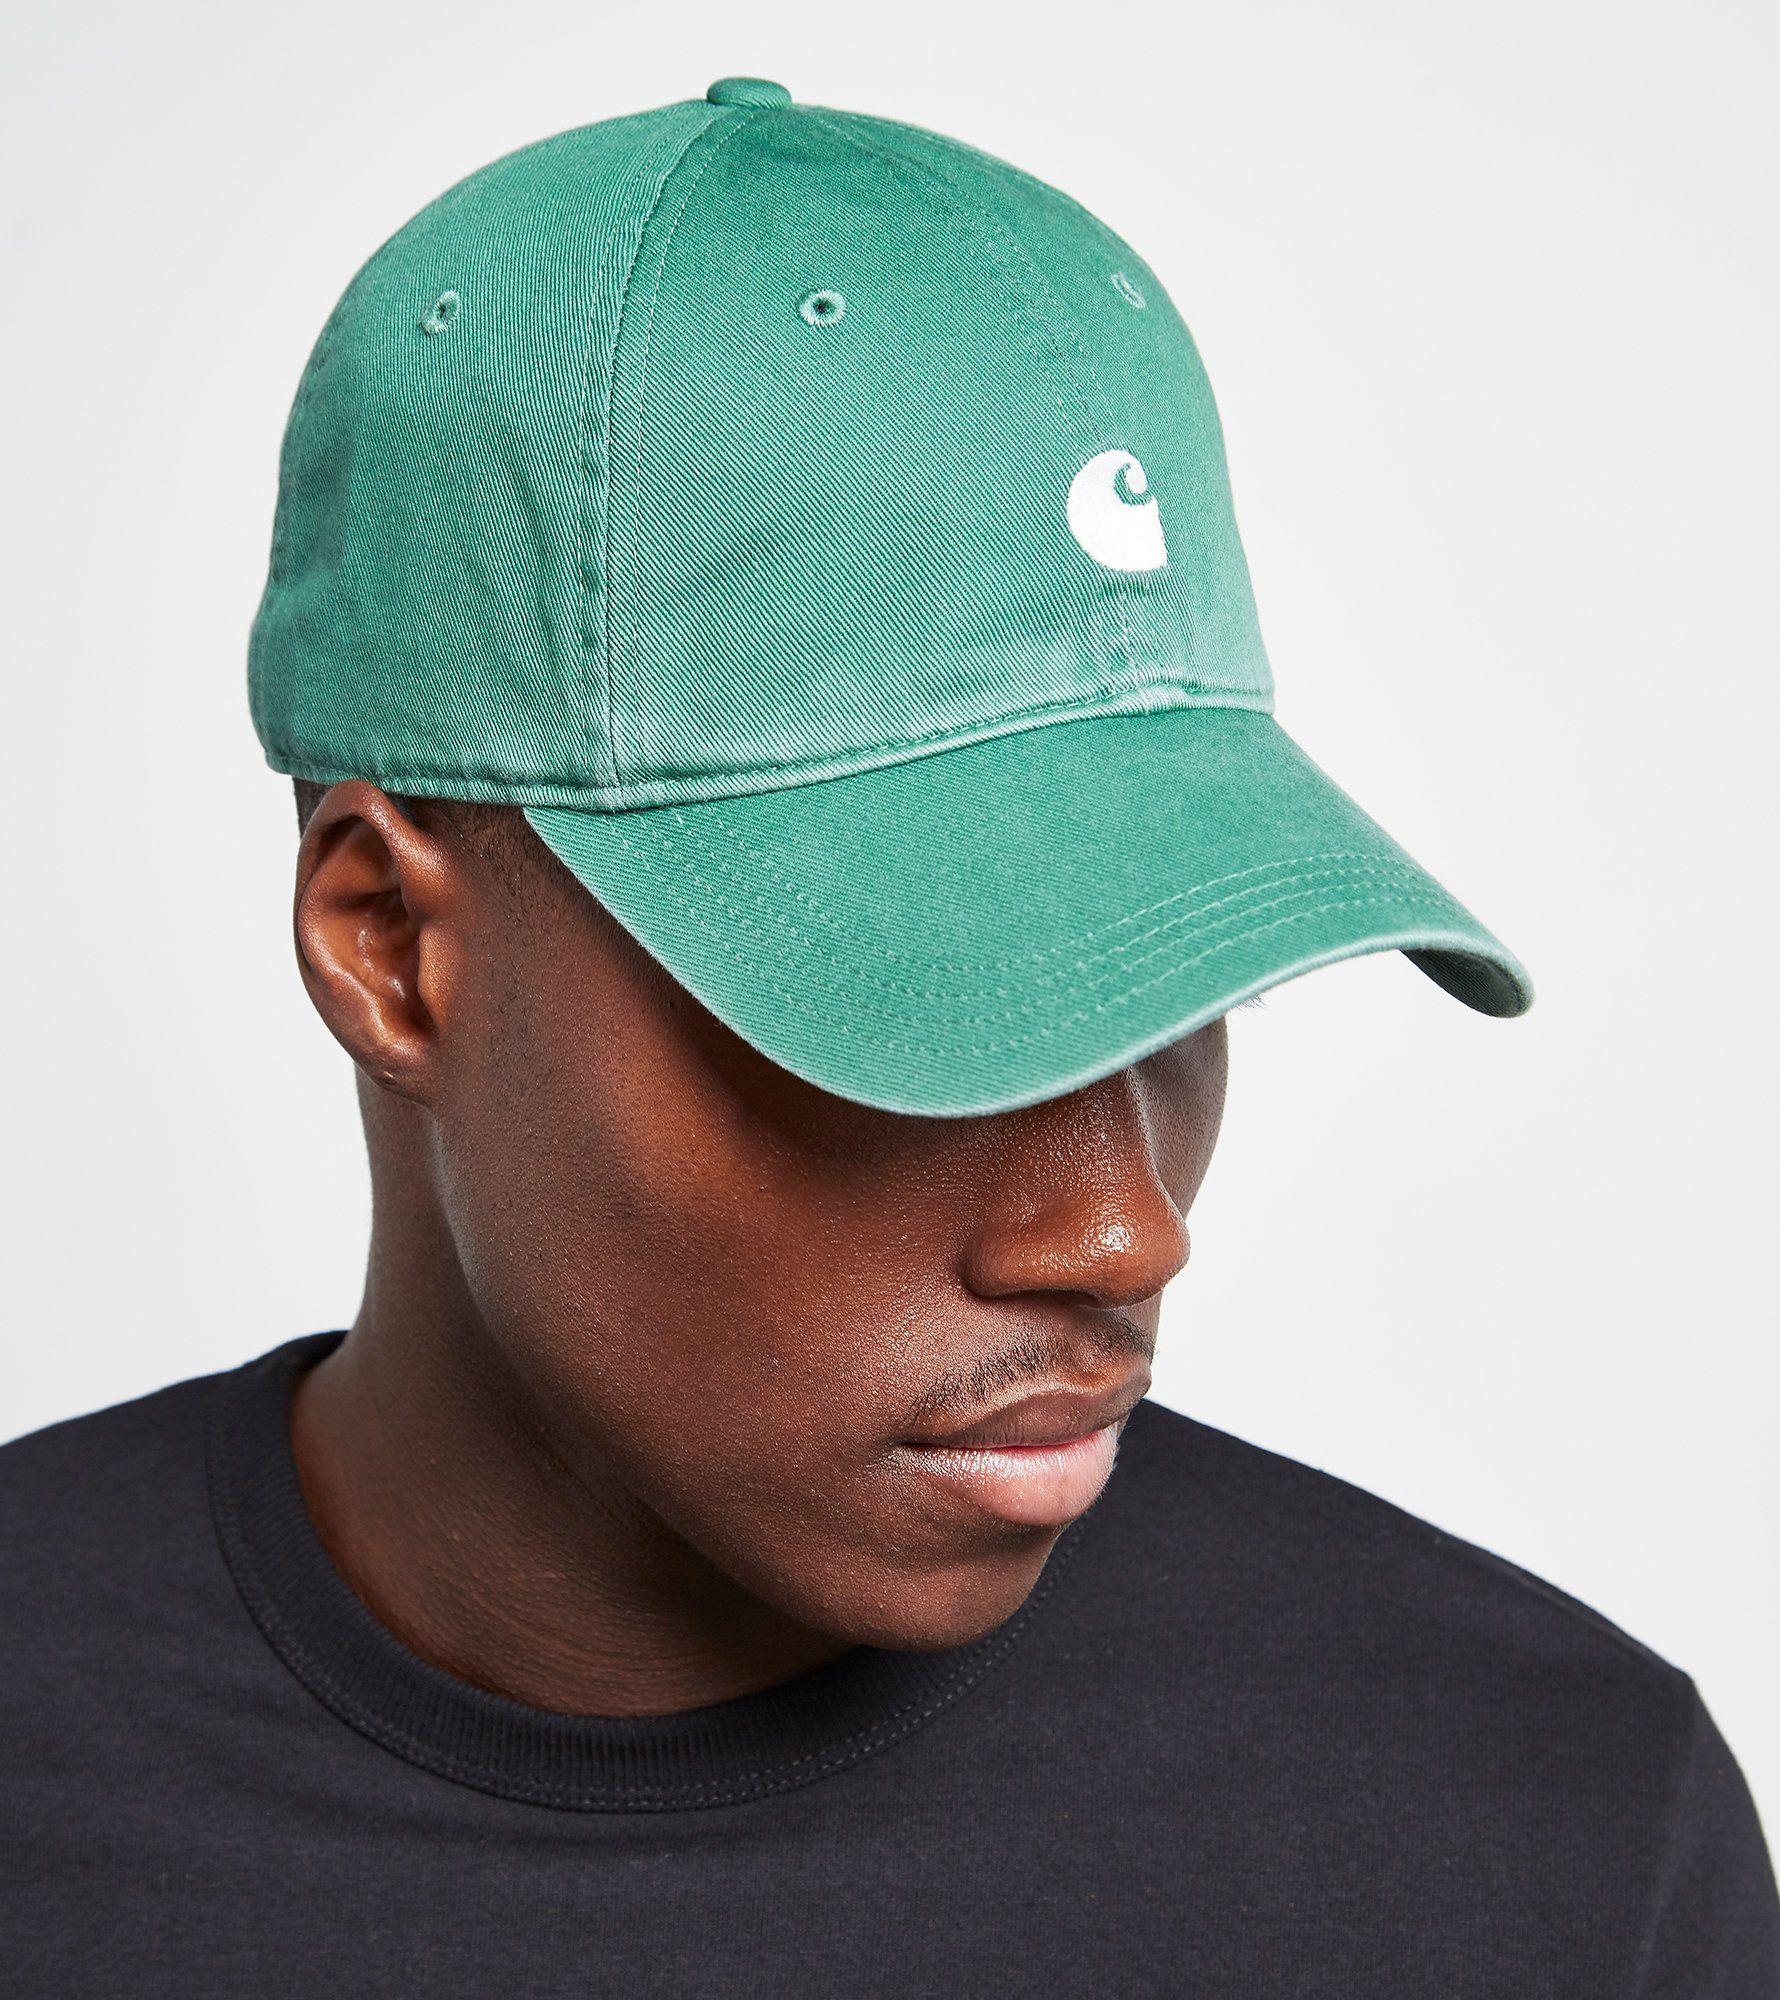 36bb8bc3b3aabe usa carhartt wip hats madison logo baseball cap teal from village hats.  ec560 7a0f7; usa carhartt wip major cap 07717 f116a